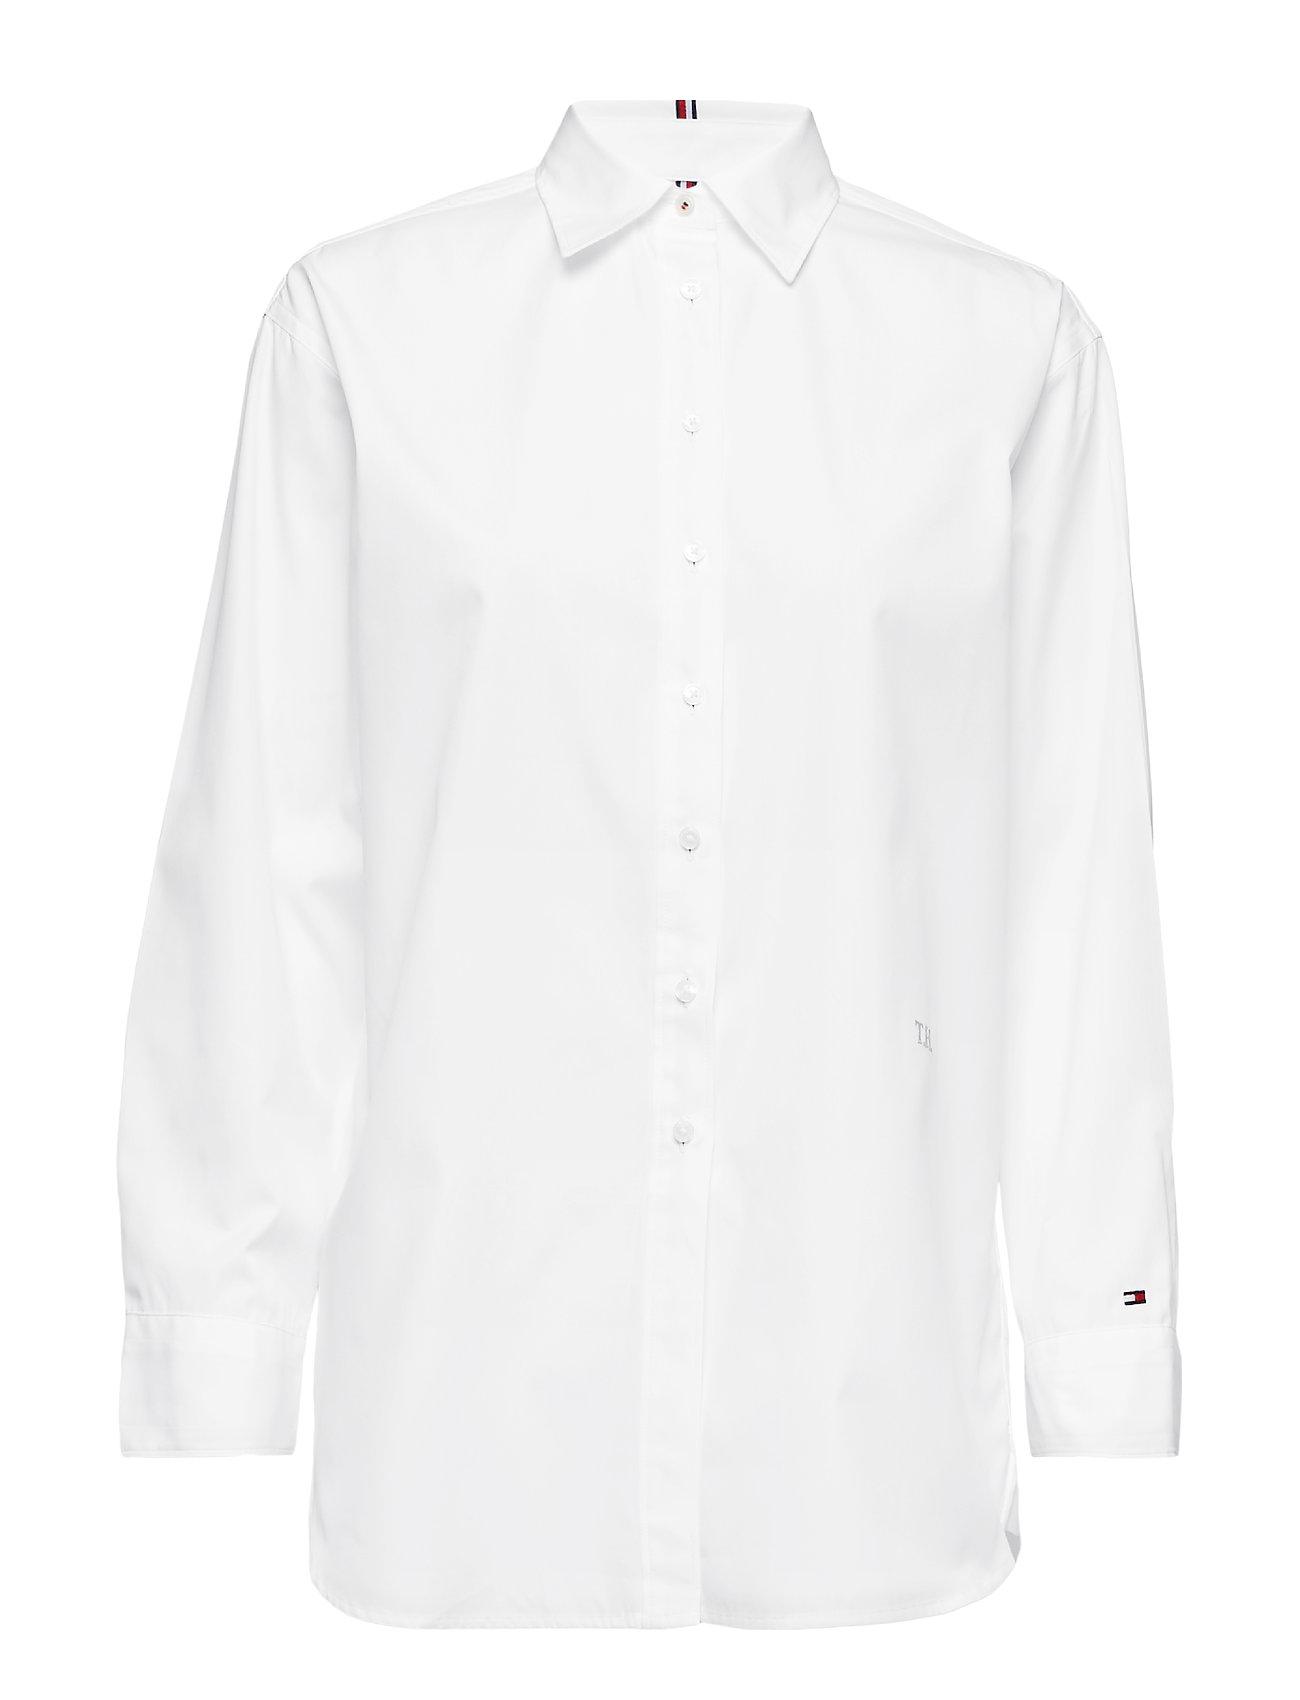 Tommy Hilfiger TH ESSENTIAL BOYFRIEND SHIRT - CLASSIC WHITE